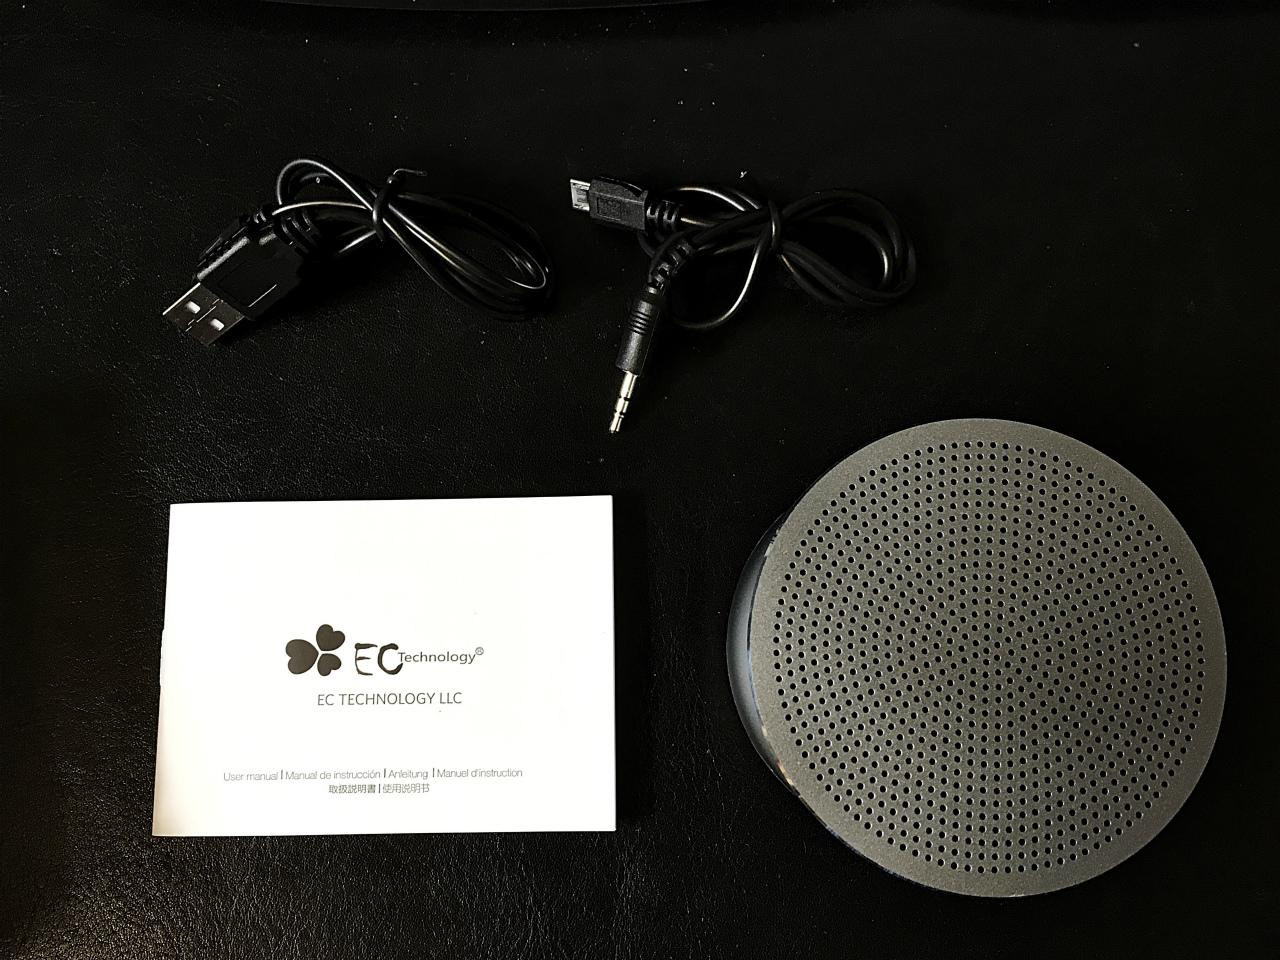 pr-ec-technology-s1021001-02